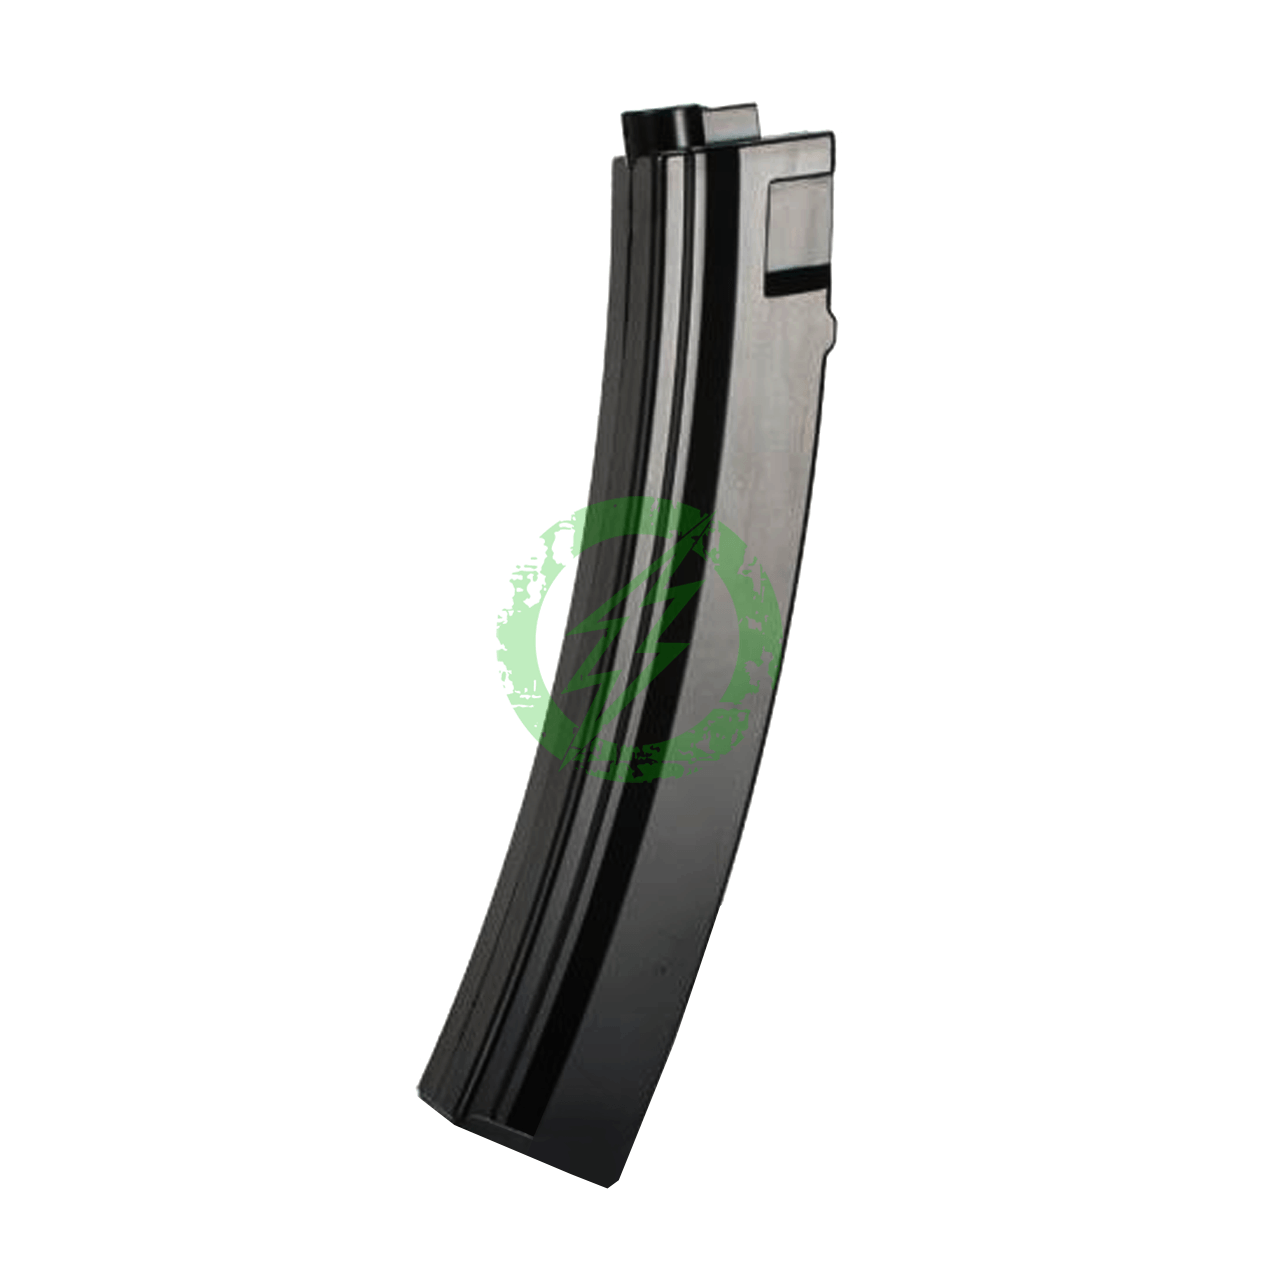 Umarex   Elite Force H&K 95rd MP5 Mid-Cap Magazine   Single